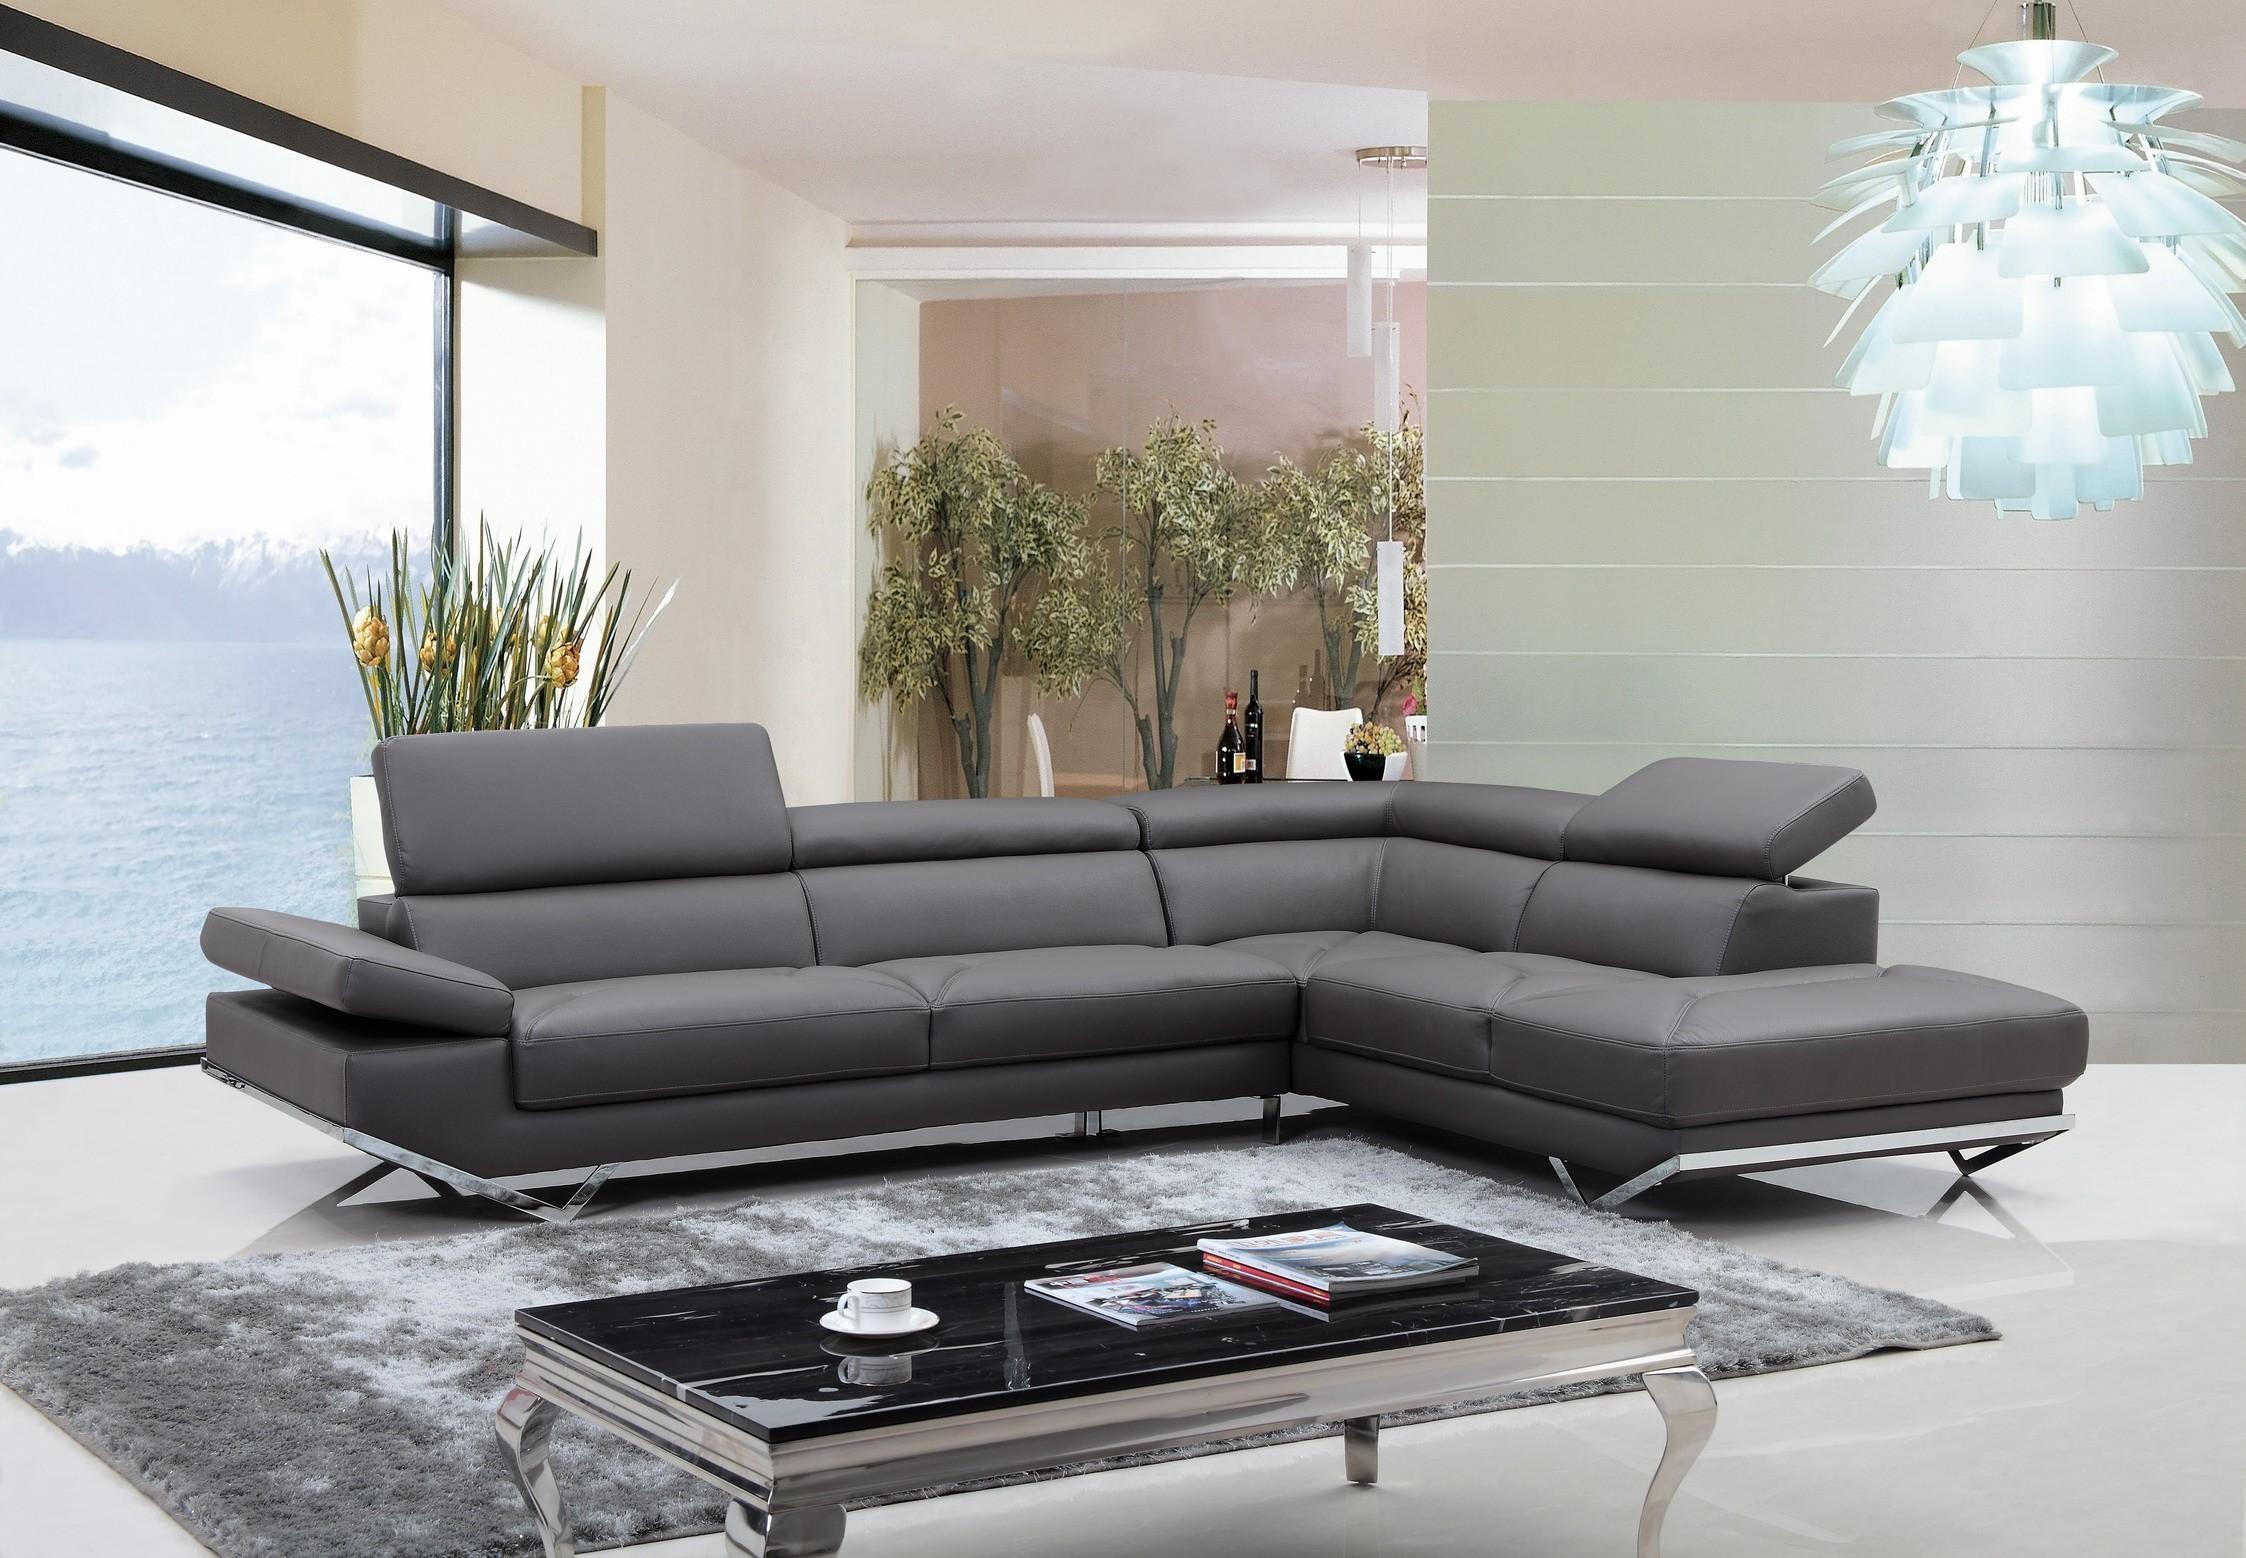 Casa Quebec Modern Dark Grey Eco Leather Sectional Sofa Intended For Gray Leather Sectional Sofas (Image 6 of 21)